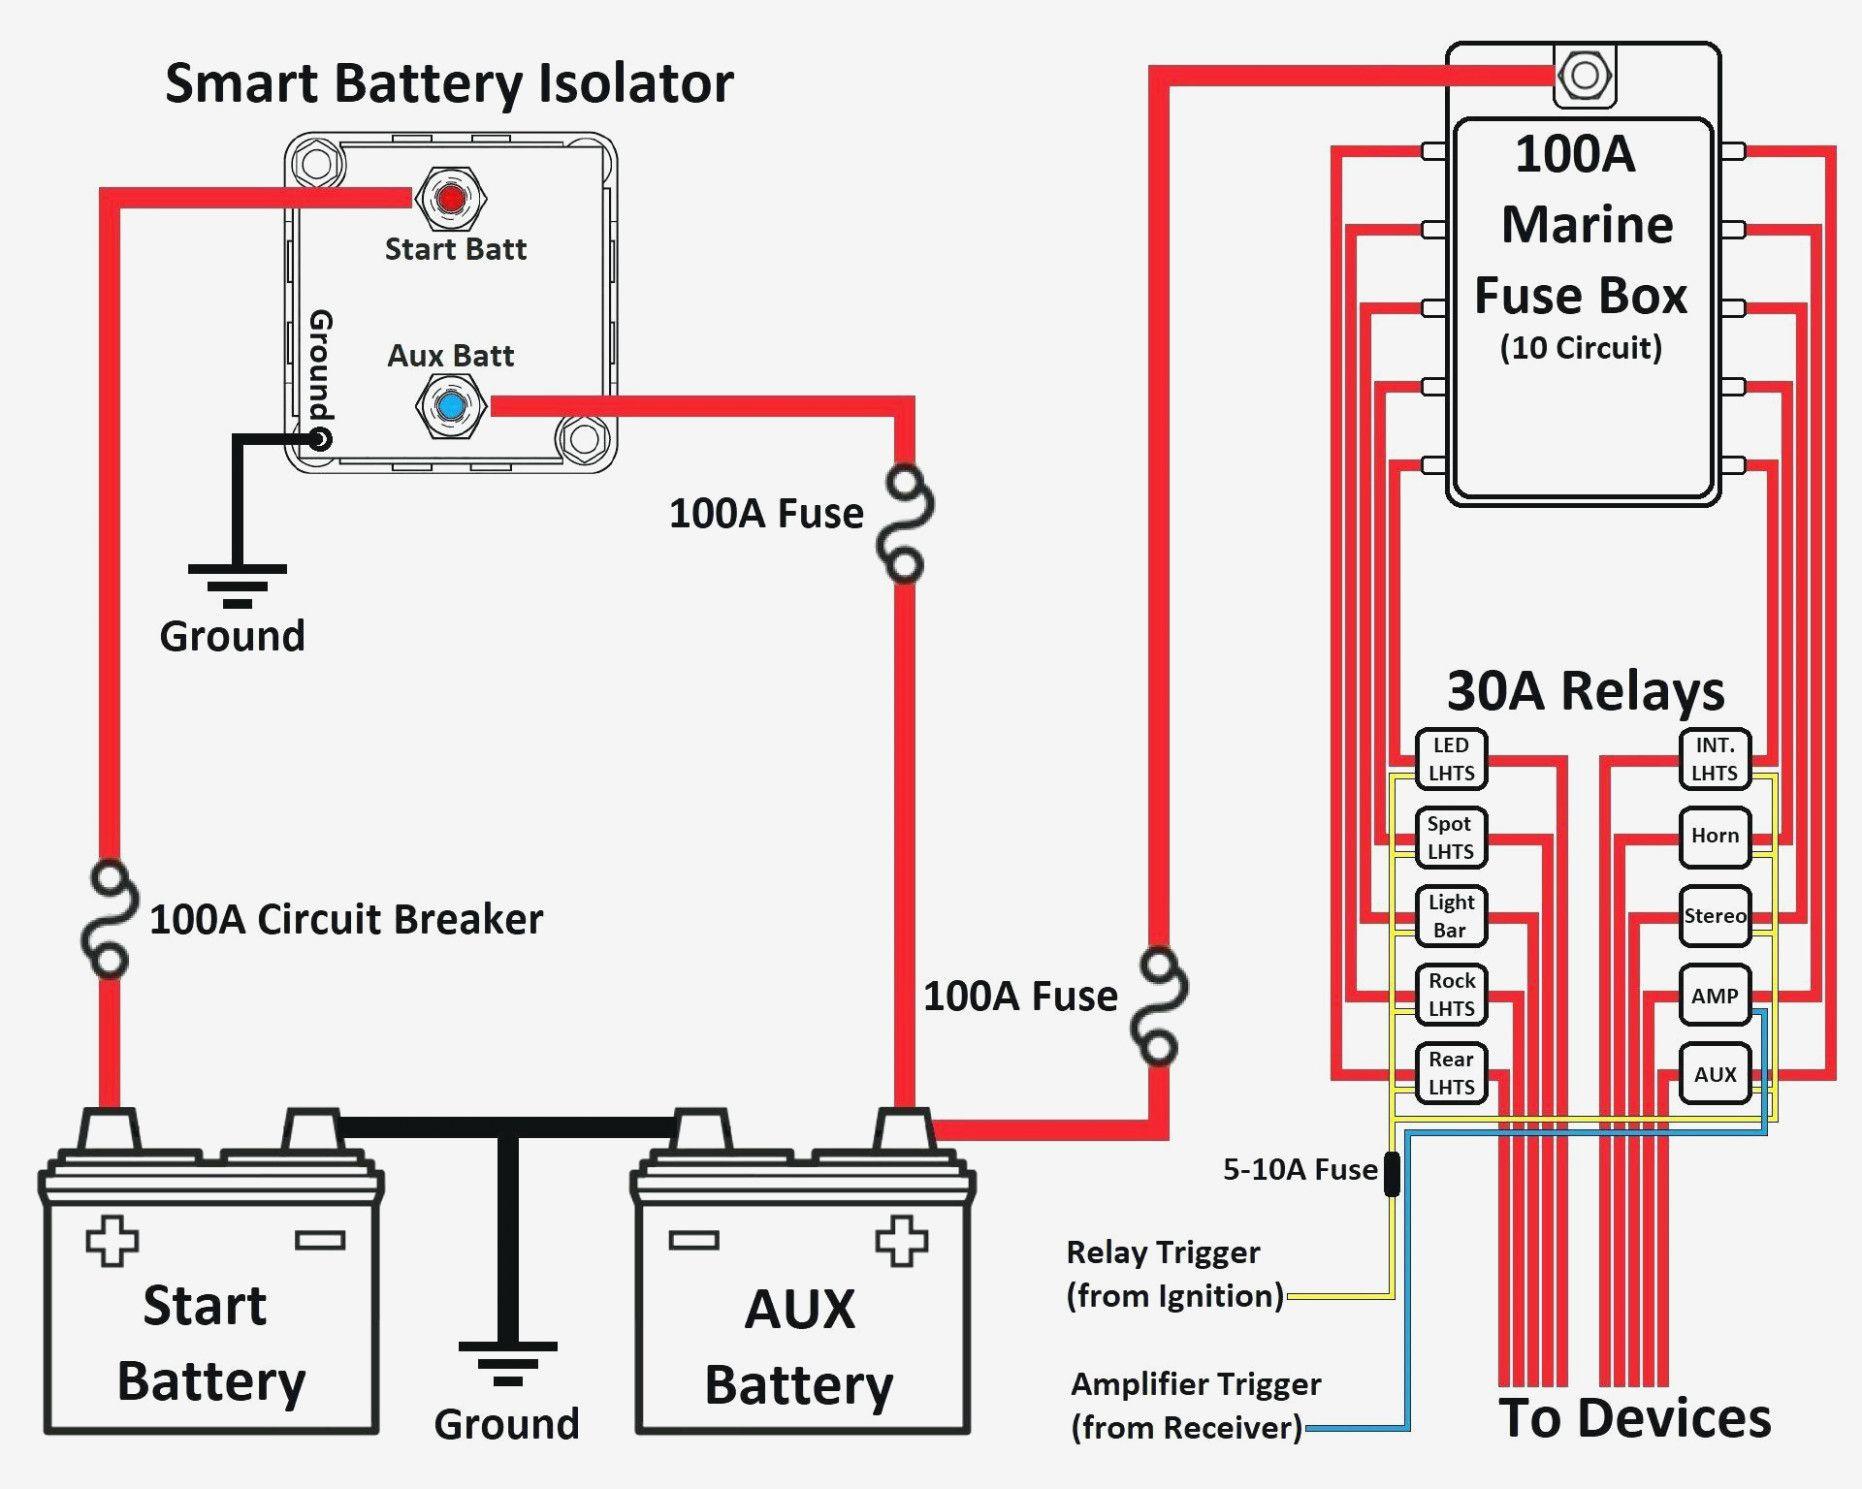 medium resolution of boat amp wiring diagram wiring diagram data pioneer amp wiring diagram boat amp wiring diagram